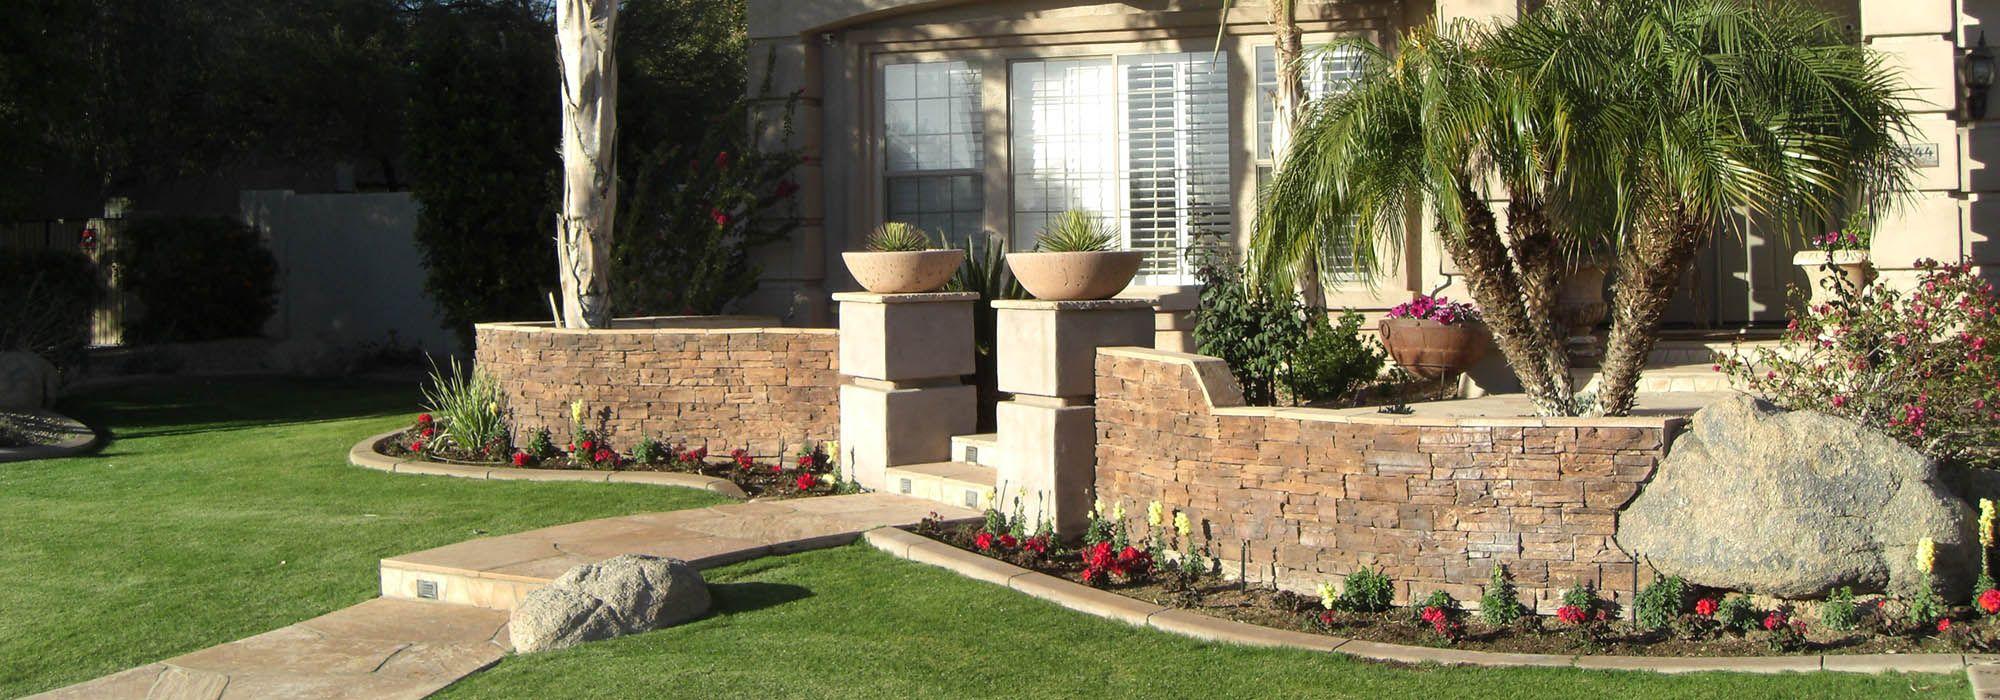 Landscape Design Gallery - Phoenix, AZ | Xtreme Green Life ...